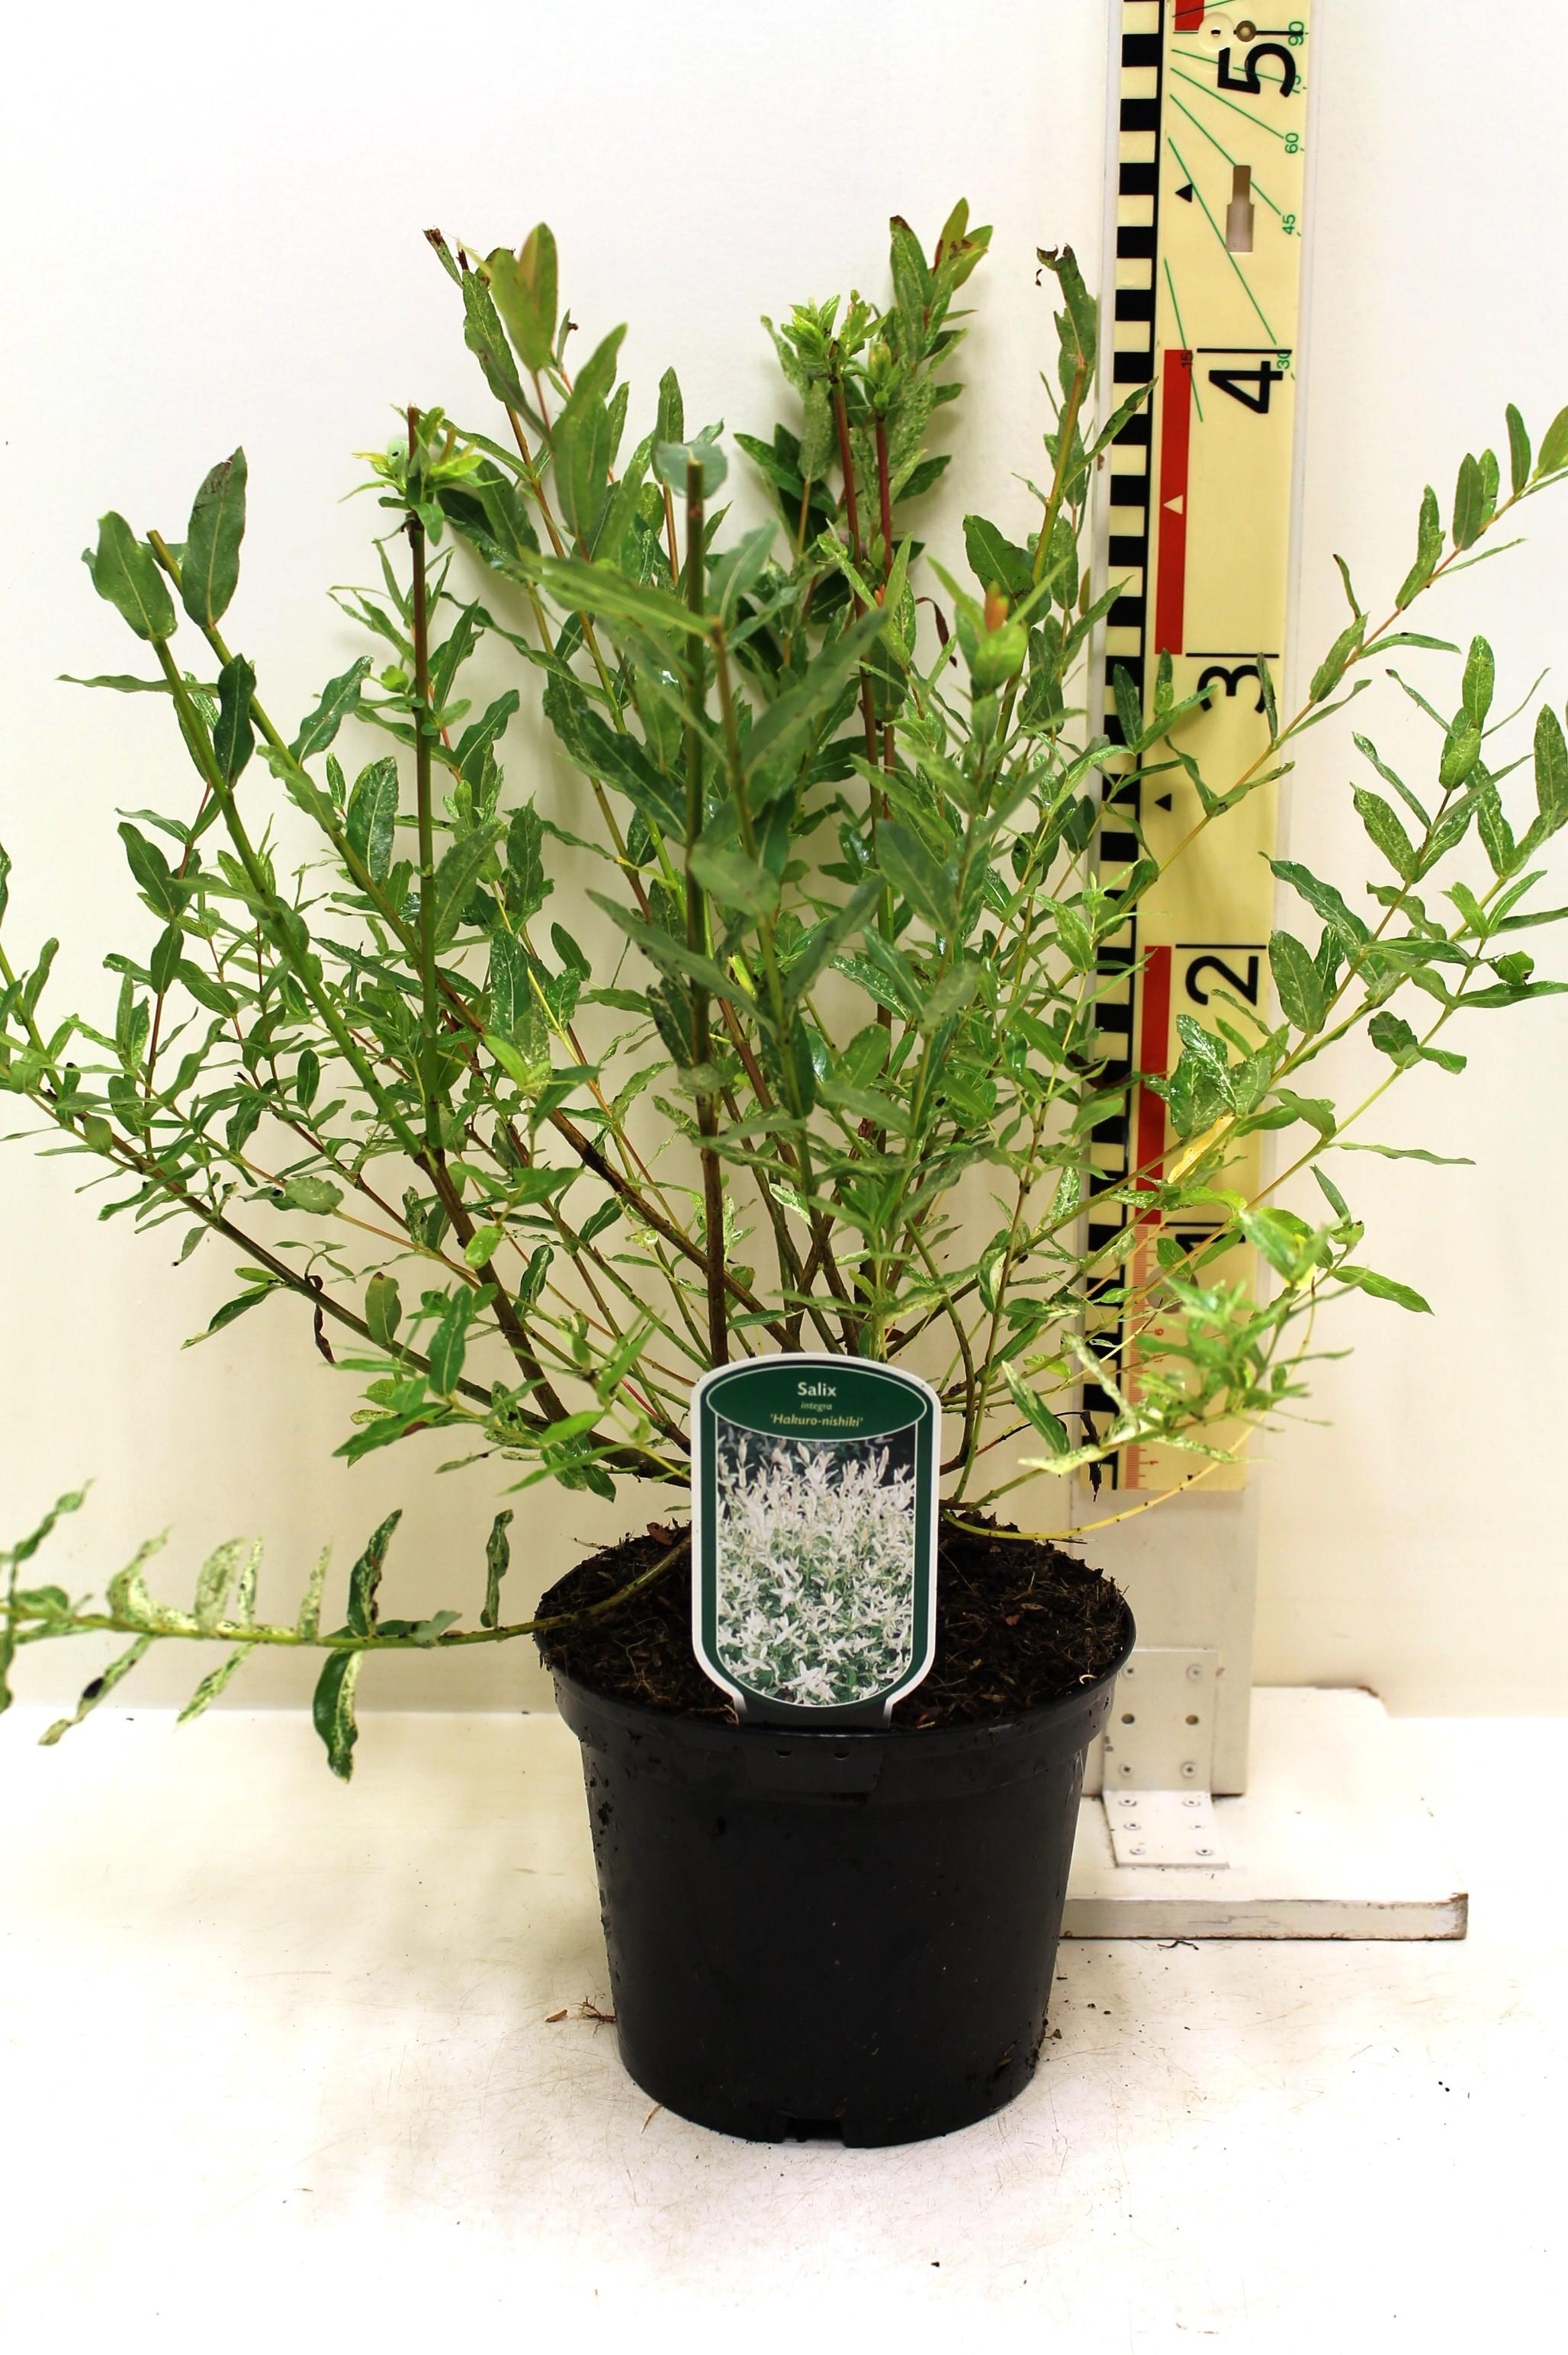 Salix integra 39 hakuro nishiki 39 boomkwekerij coonen - Salix hakuro nishiki taille ...